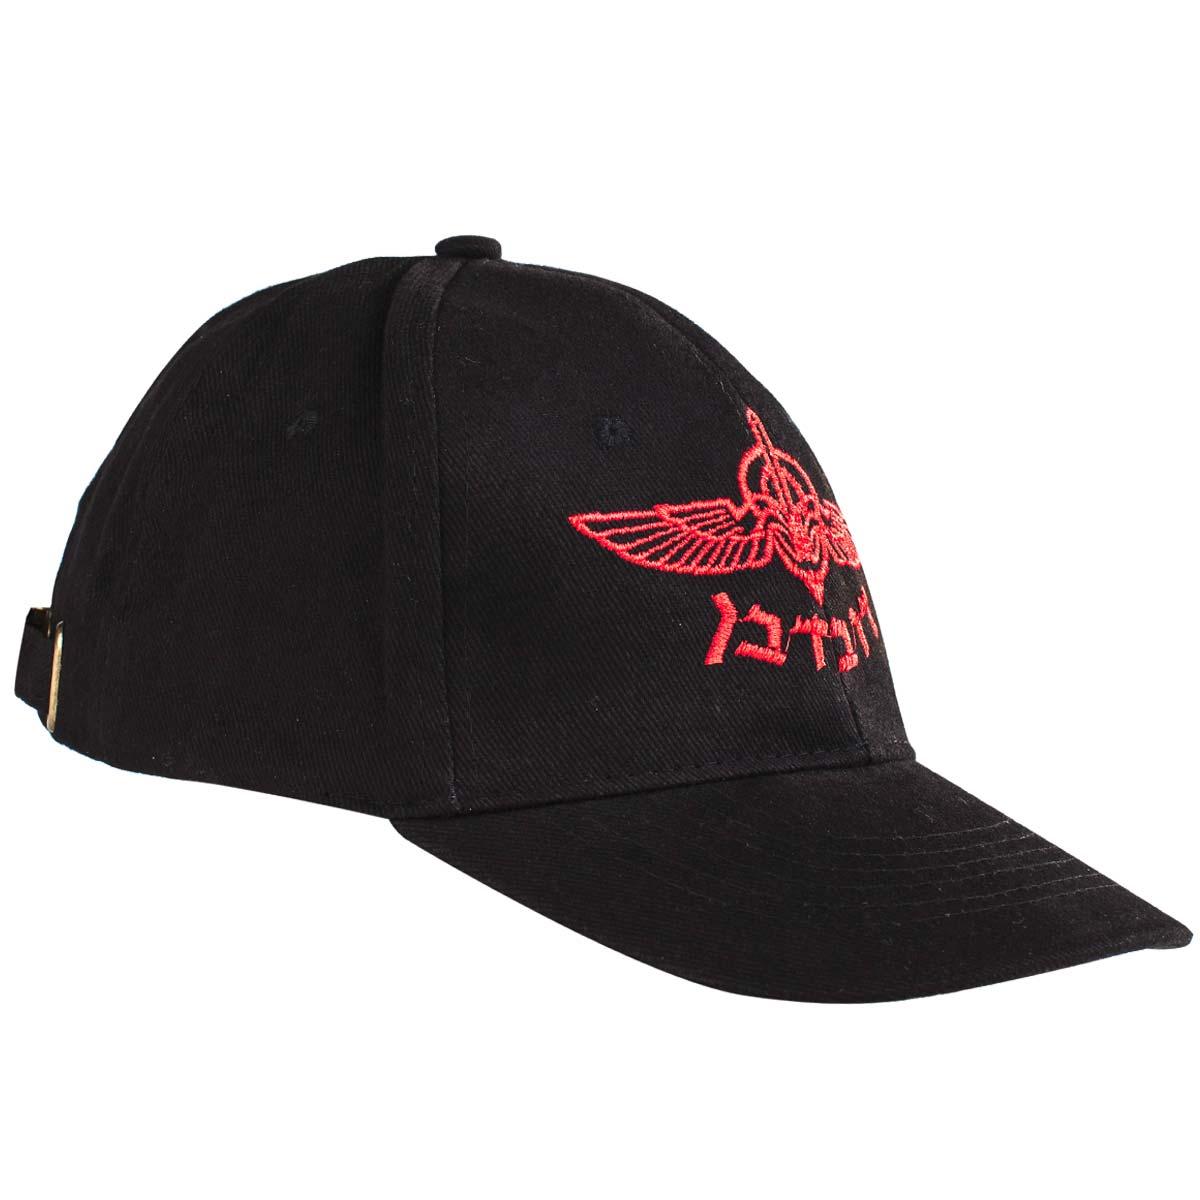 82f54c1413d IDF Duvdevan Counter Terror Unit Embroidered Ball Cap